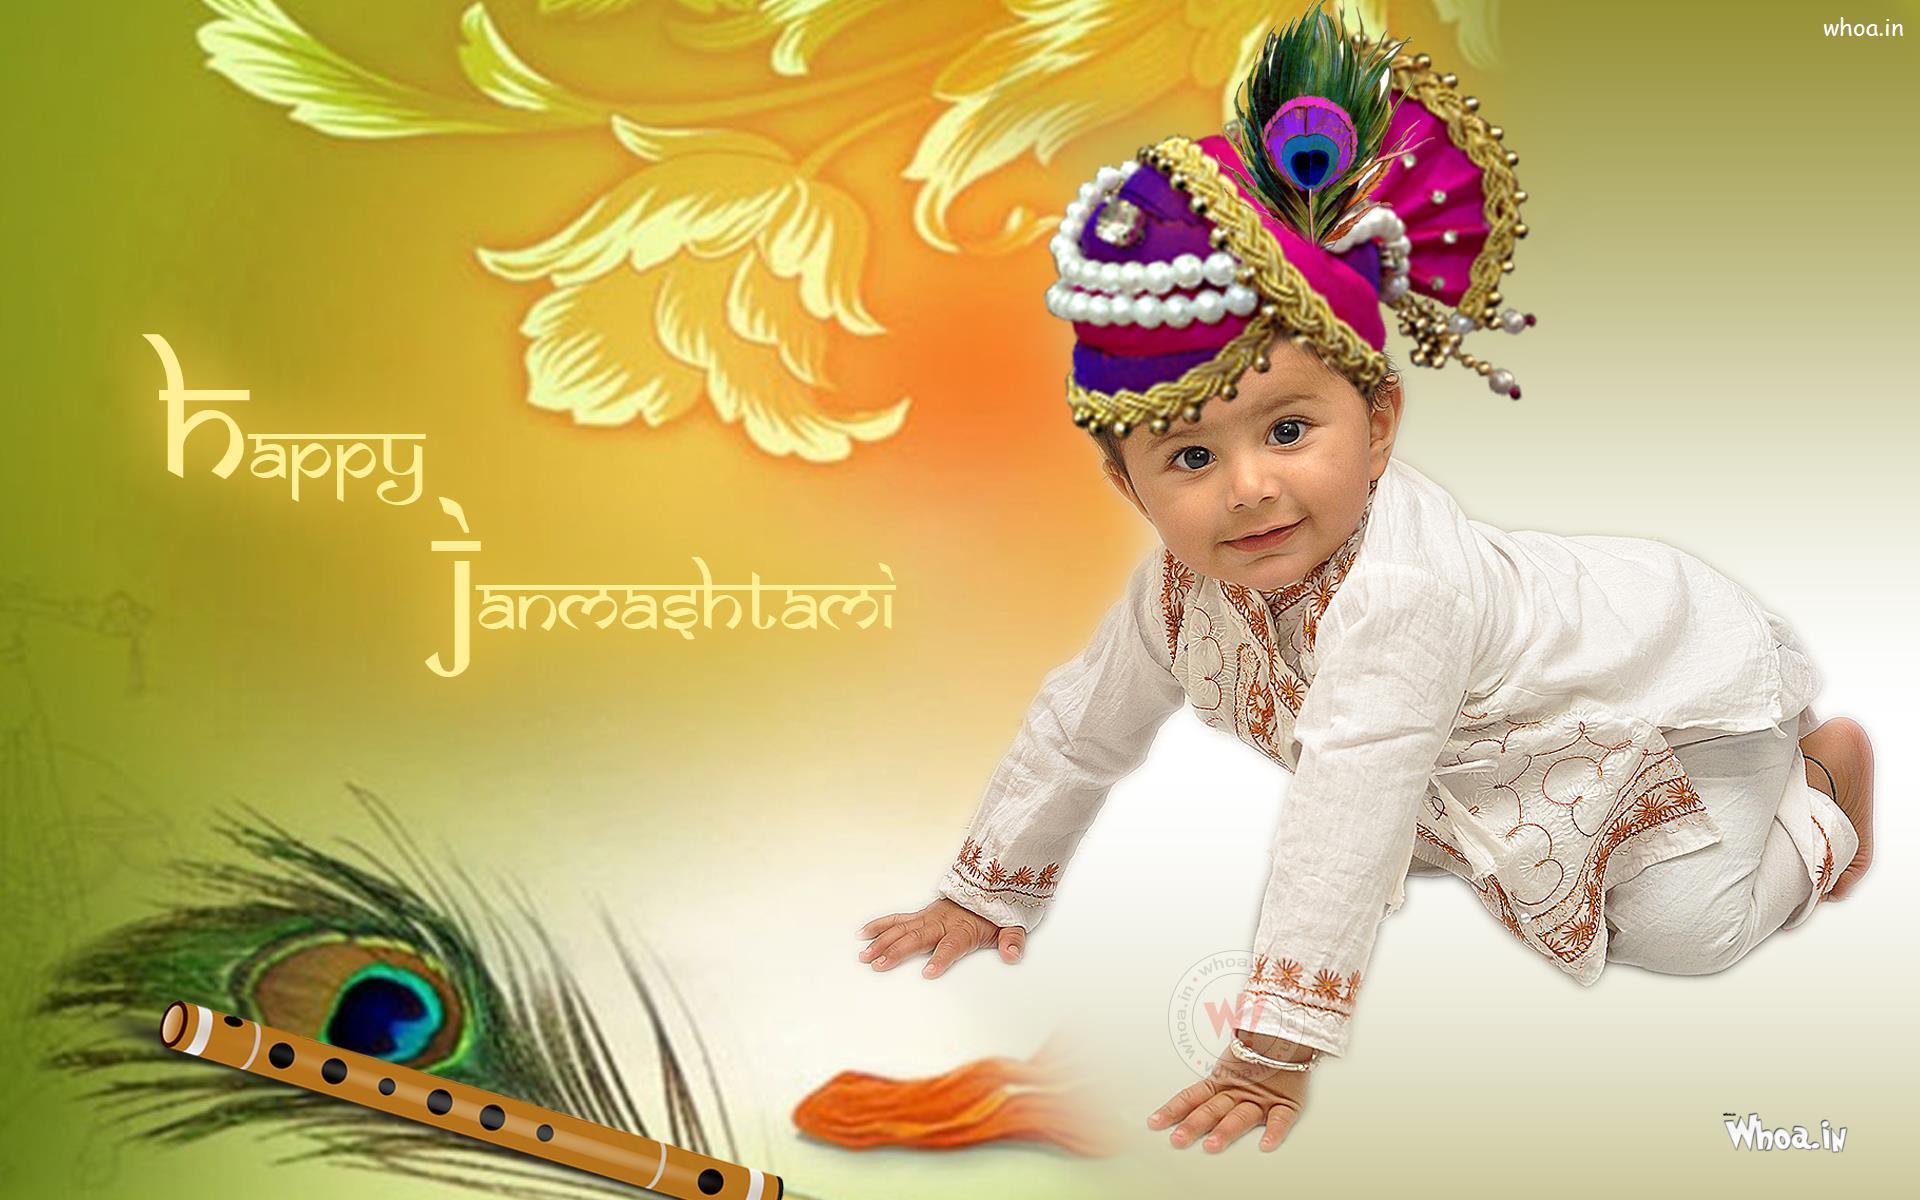 Wallpaper download janmashtami - Jay Gopal Happy Janmashtami Wallpaper With Little Cute Boy